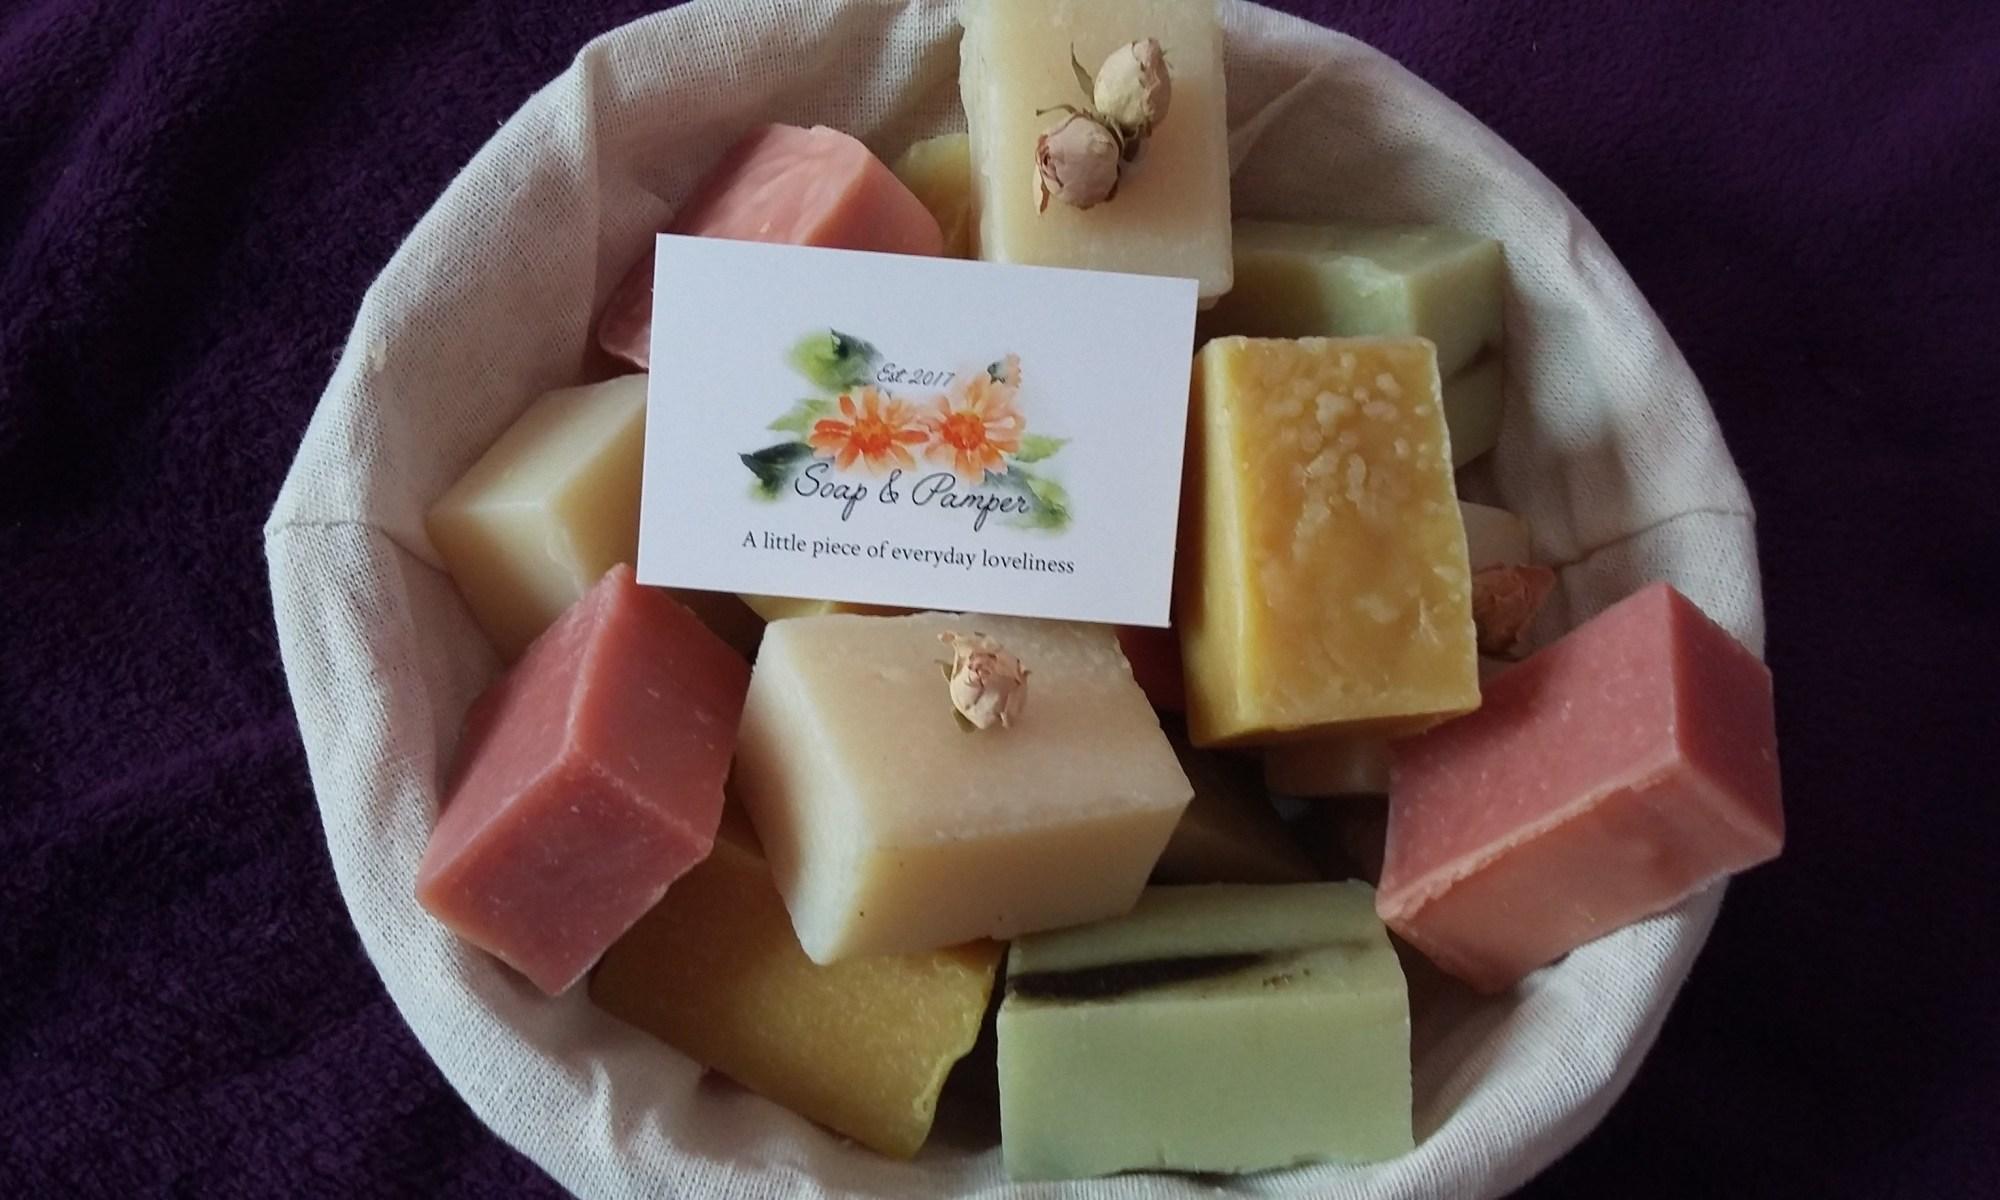 Basket of natural soaps